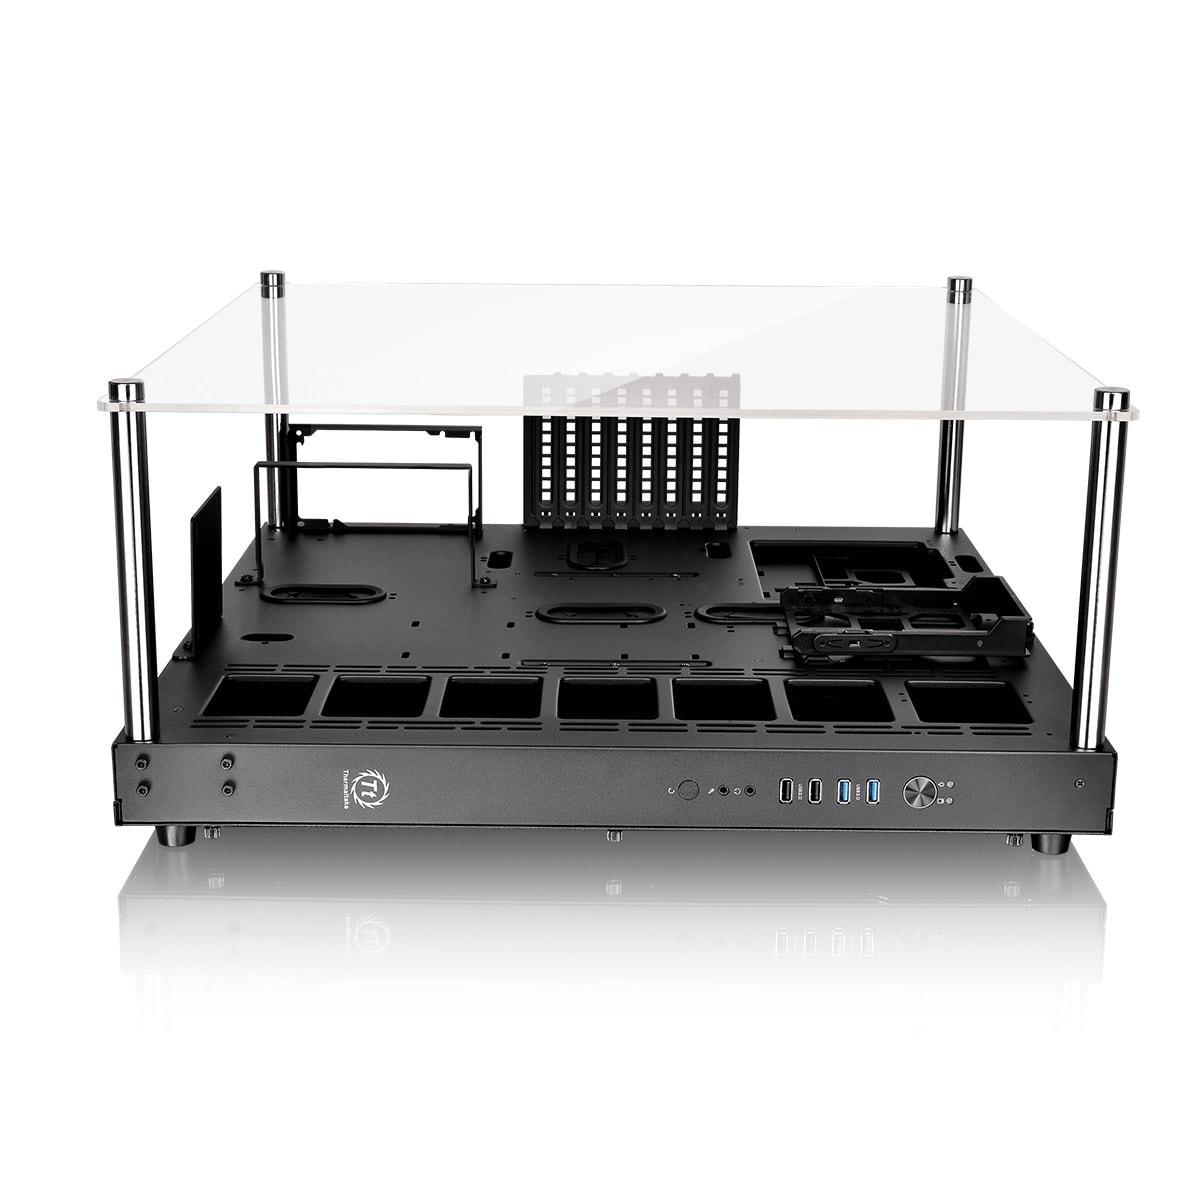 Thermaltake Core P5 (CA-1E7-00M1WN-00) - Achat / Vente Boîtier PC sur Cybertek.fr - 1